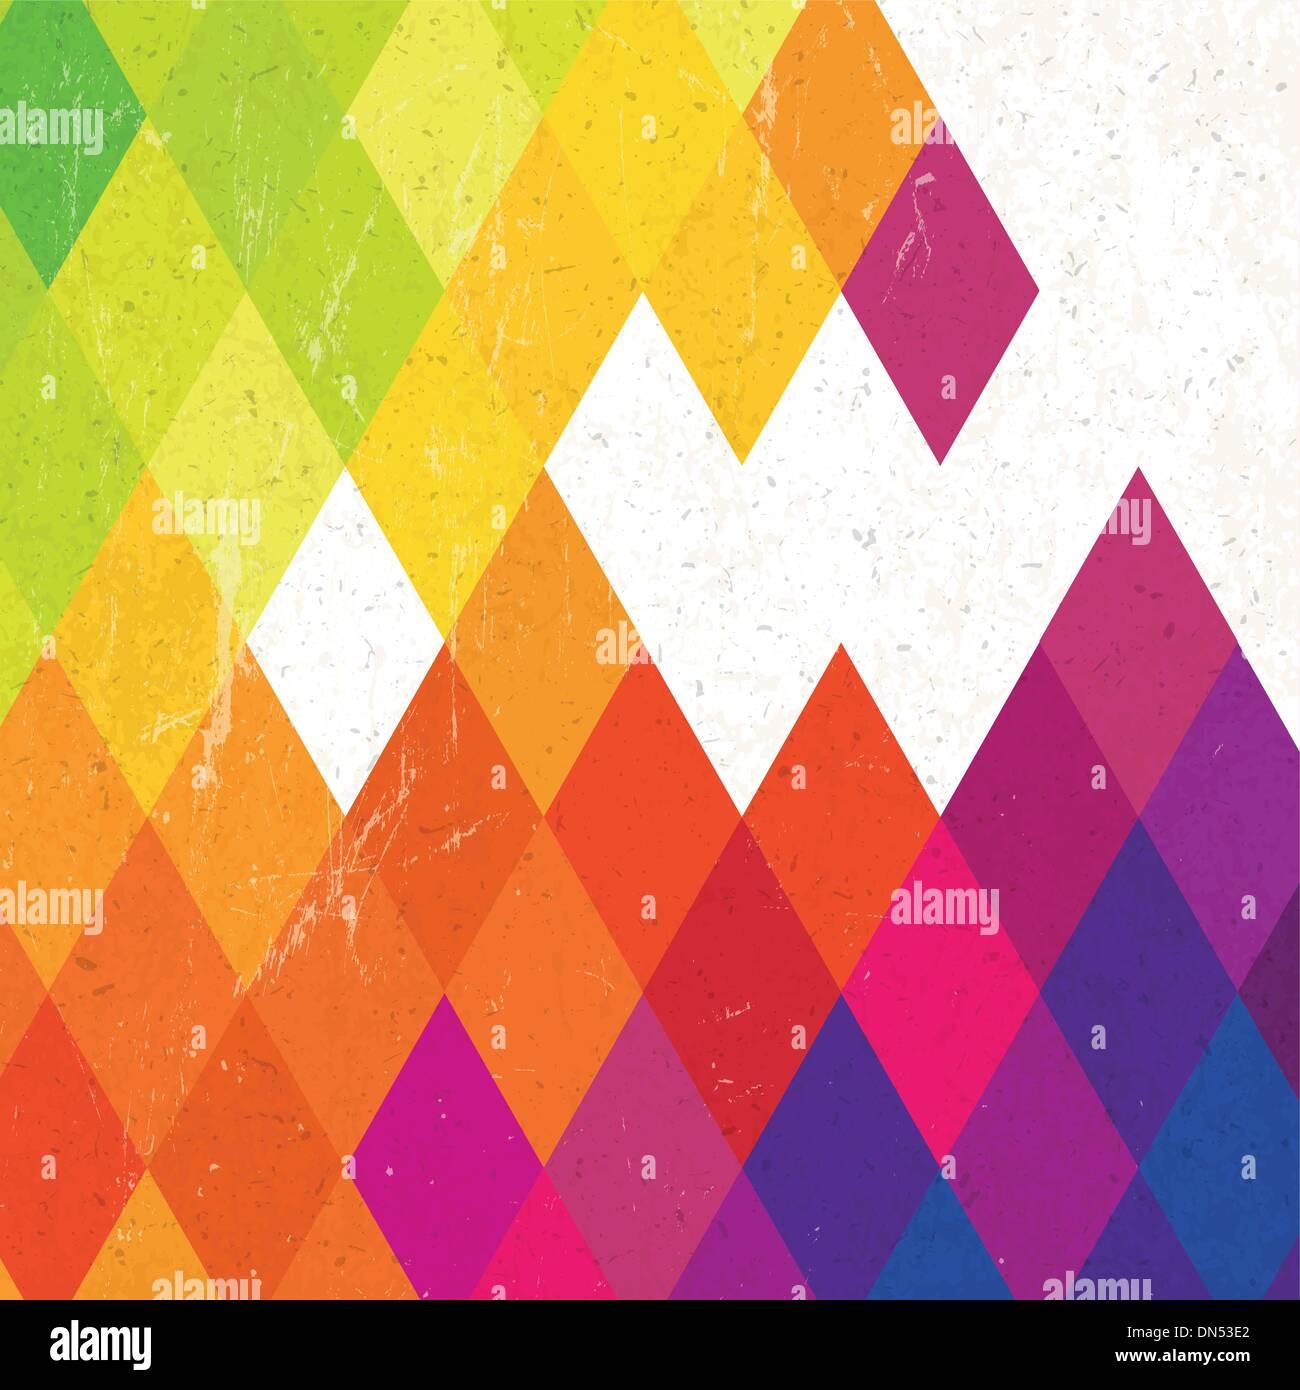 Retro coloridos fundo losango, vetor Imagens de Stock